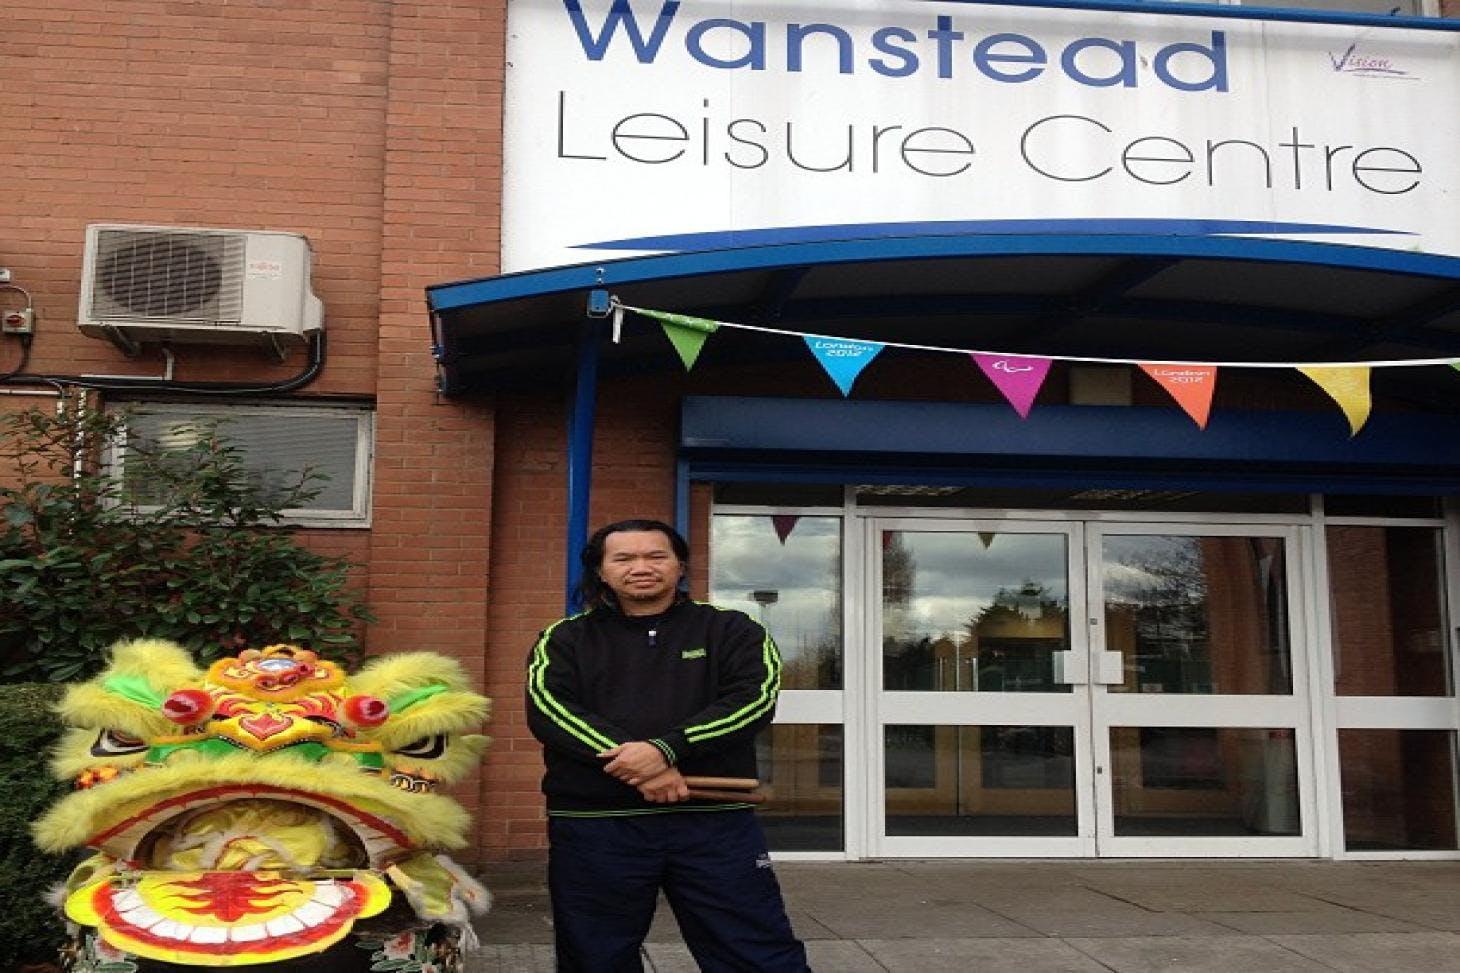 Wanstead Leisure Centre 5 a side | Grass football pitch